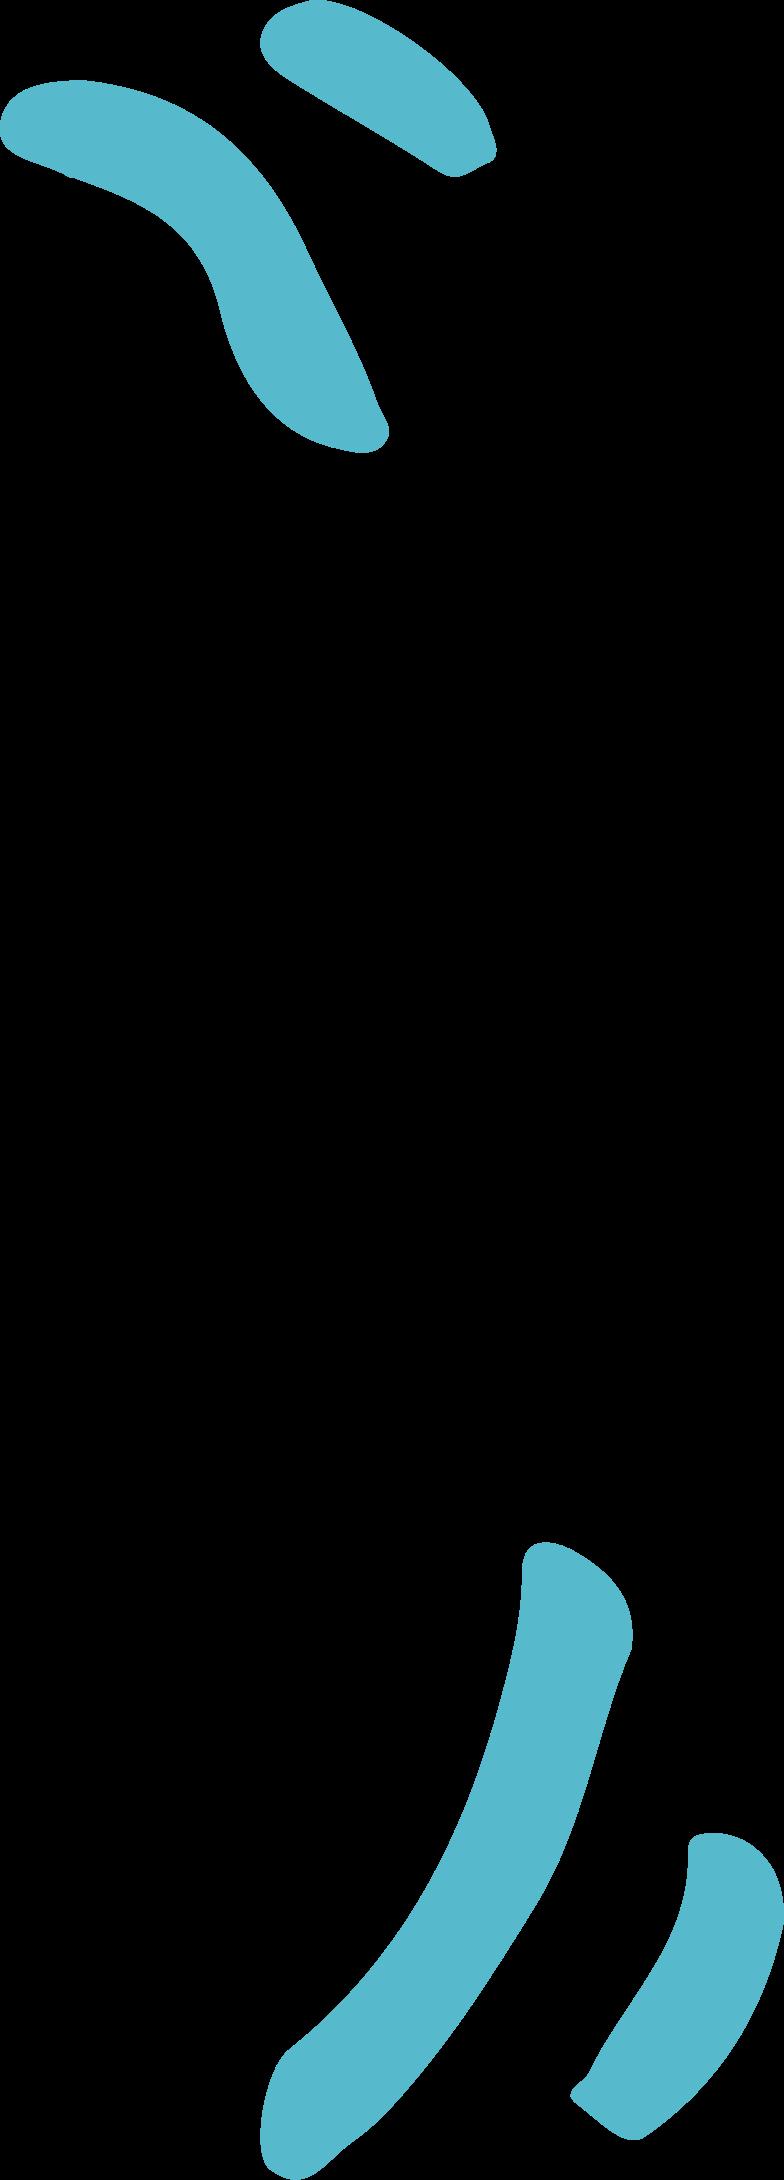 motion lines Clipart illustration in PNG, SVG